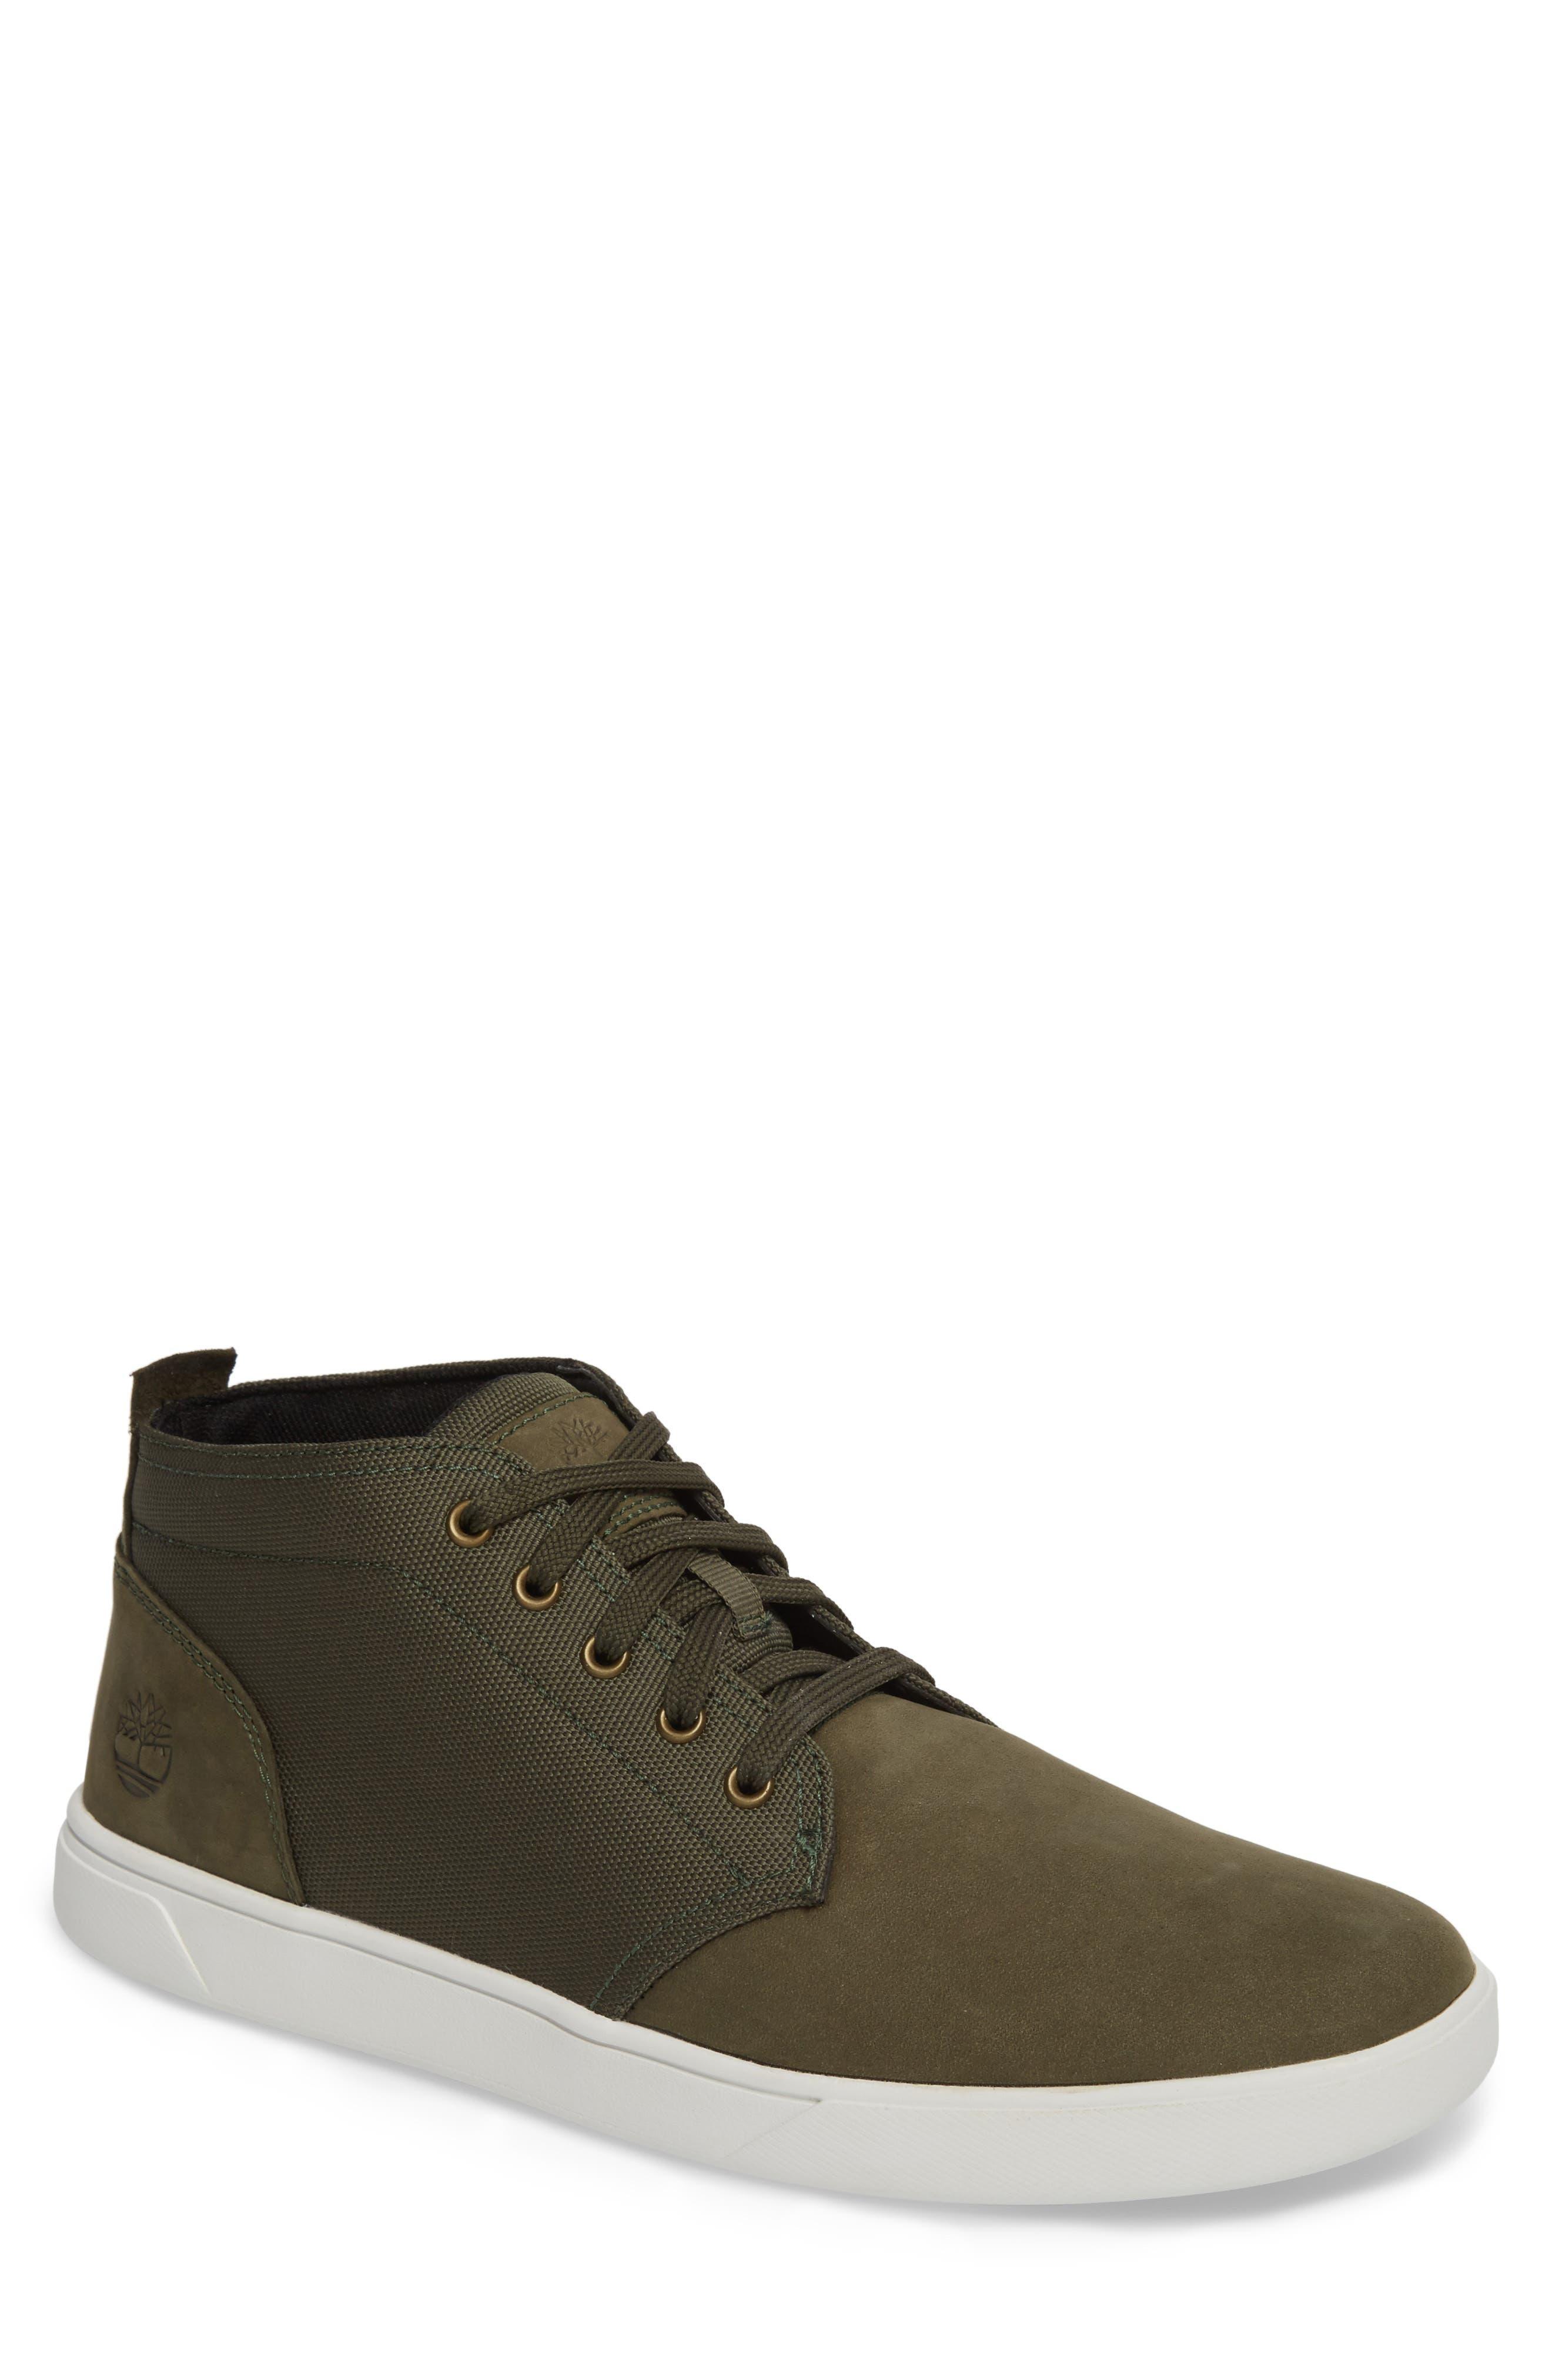 Earthkeepers<sup>®</sup> 'Groveton' Chukka Sneaker,                         Main,                         color, Grape Leaf Leather